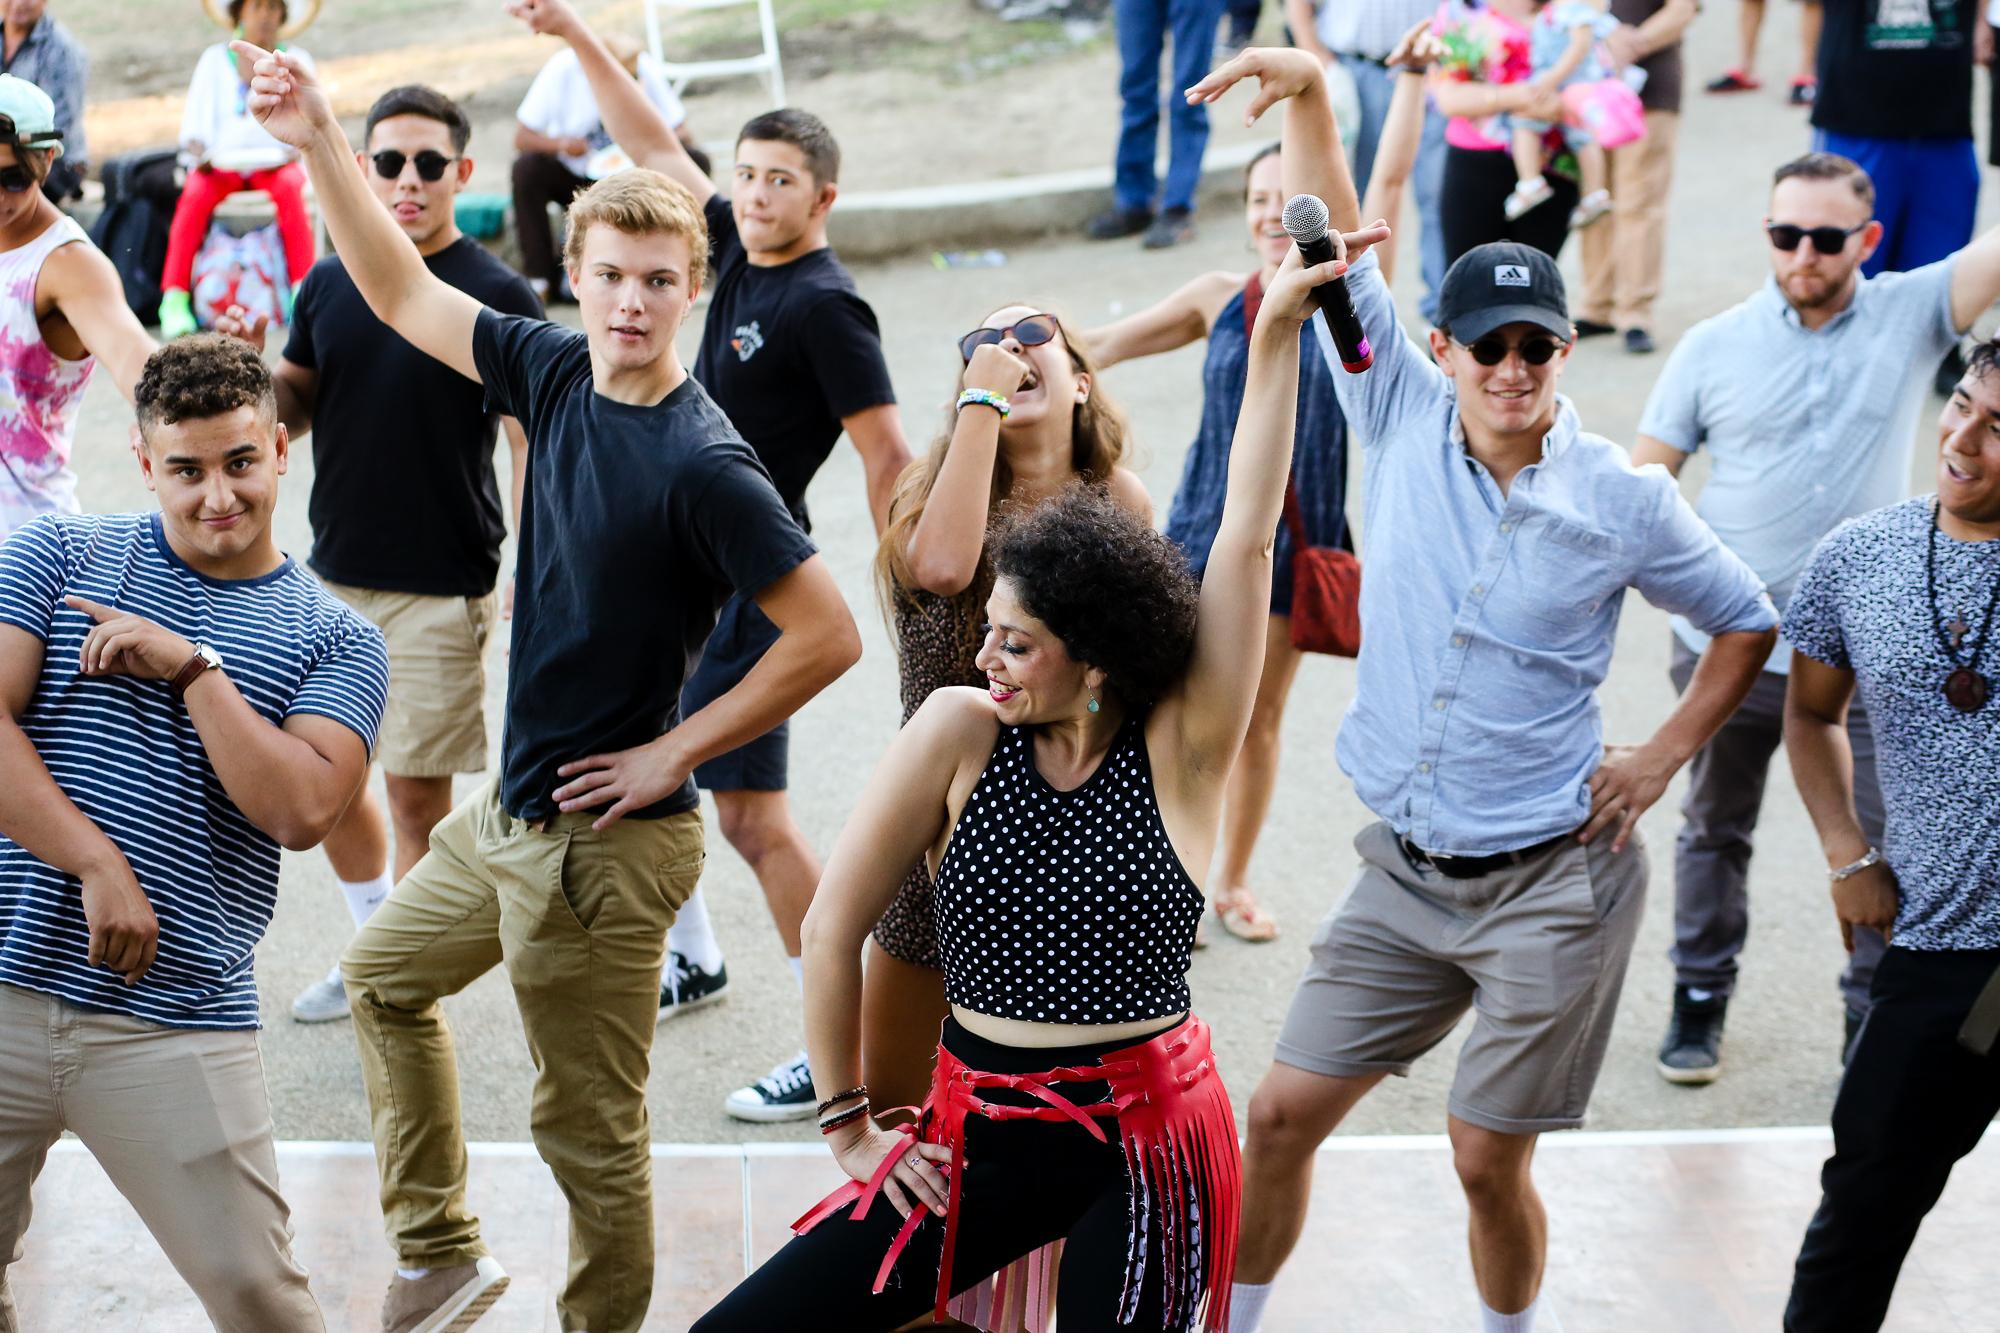 Dance Instructor, Independencia Day Tardeada, MacArthur Park, L.A